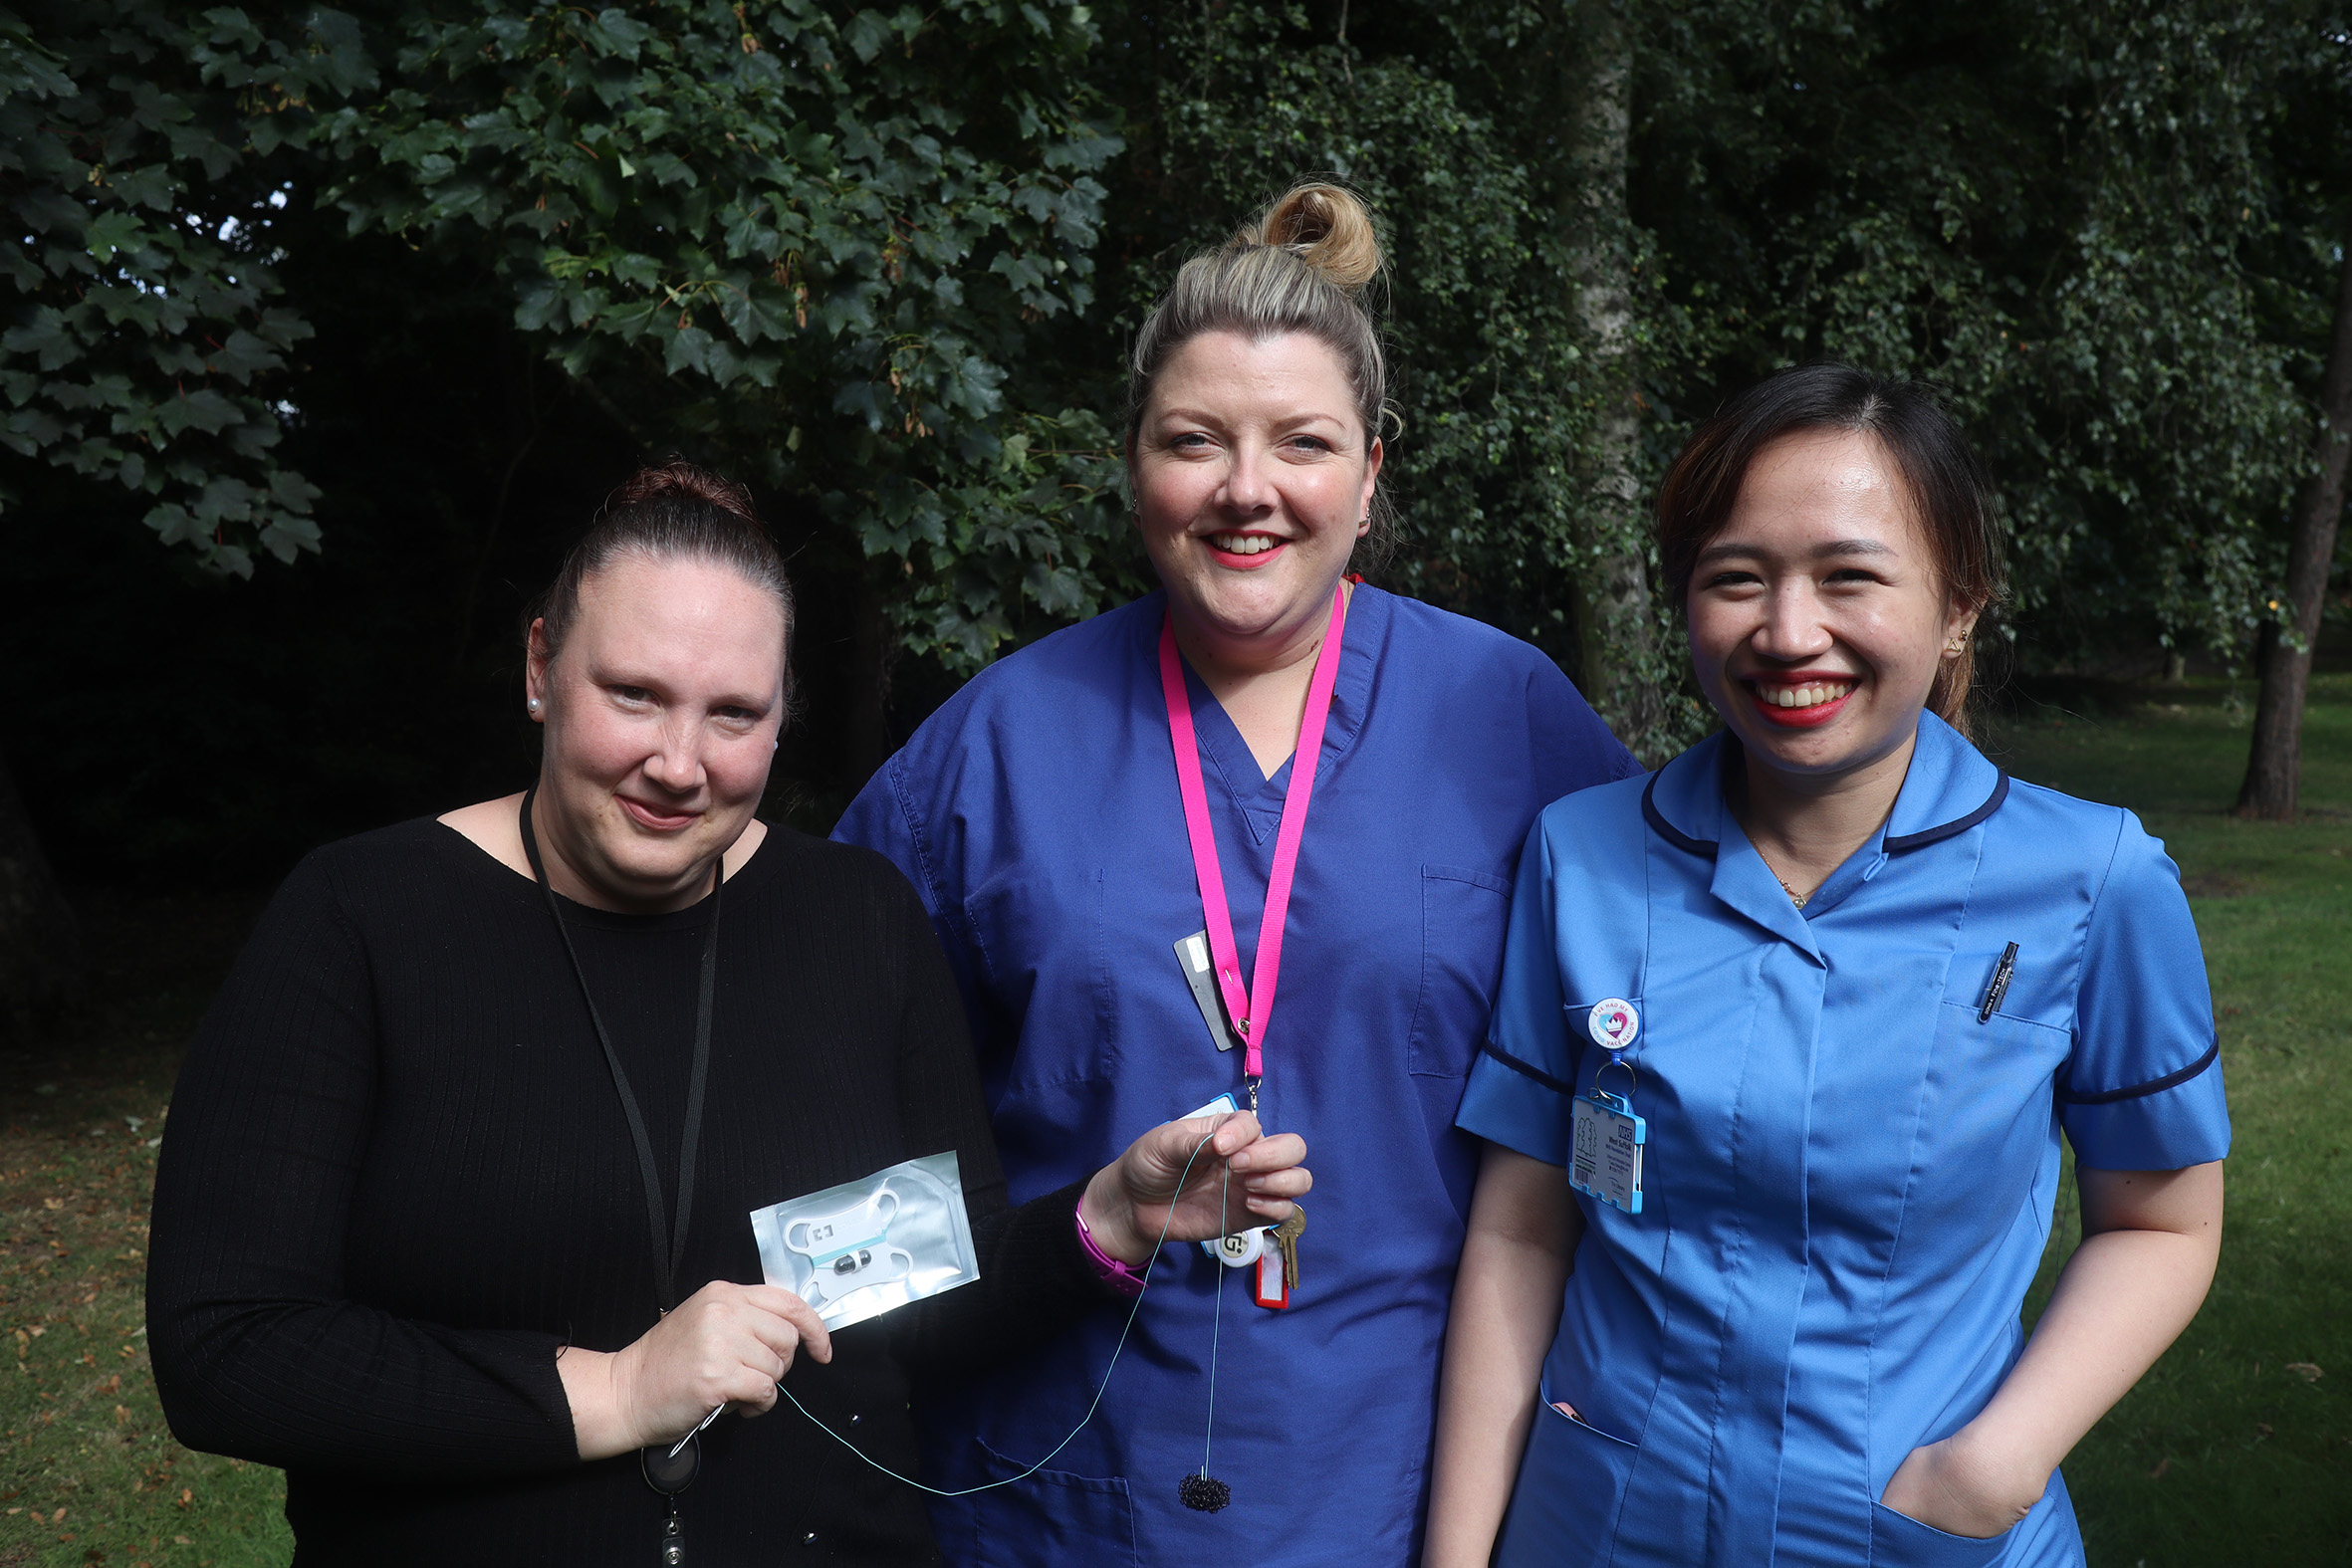 Endoscopy team members Nicola Gogin, Annie Kelling, and Winona Fajardo with the cytosponge test